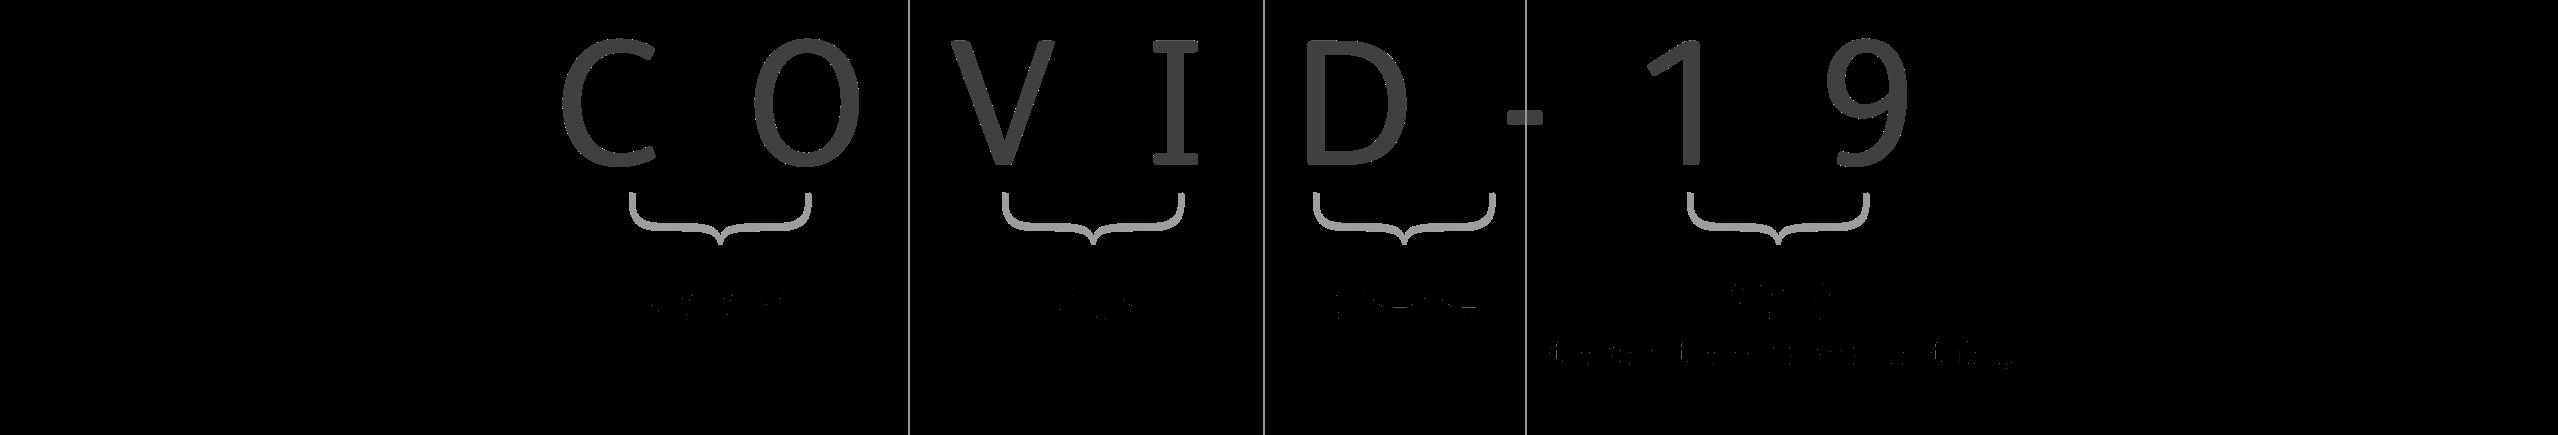 COVID-19 explained